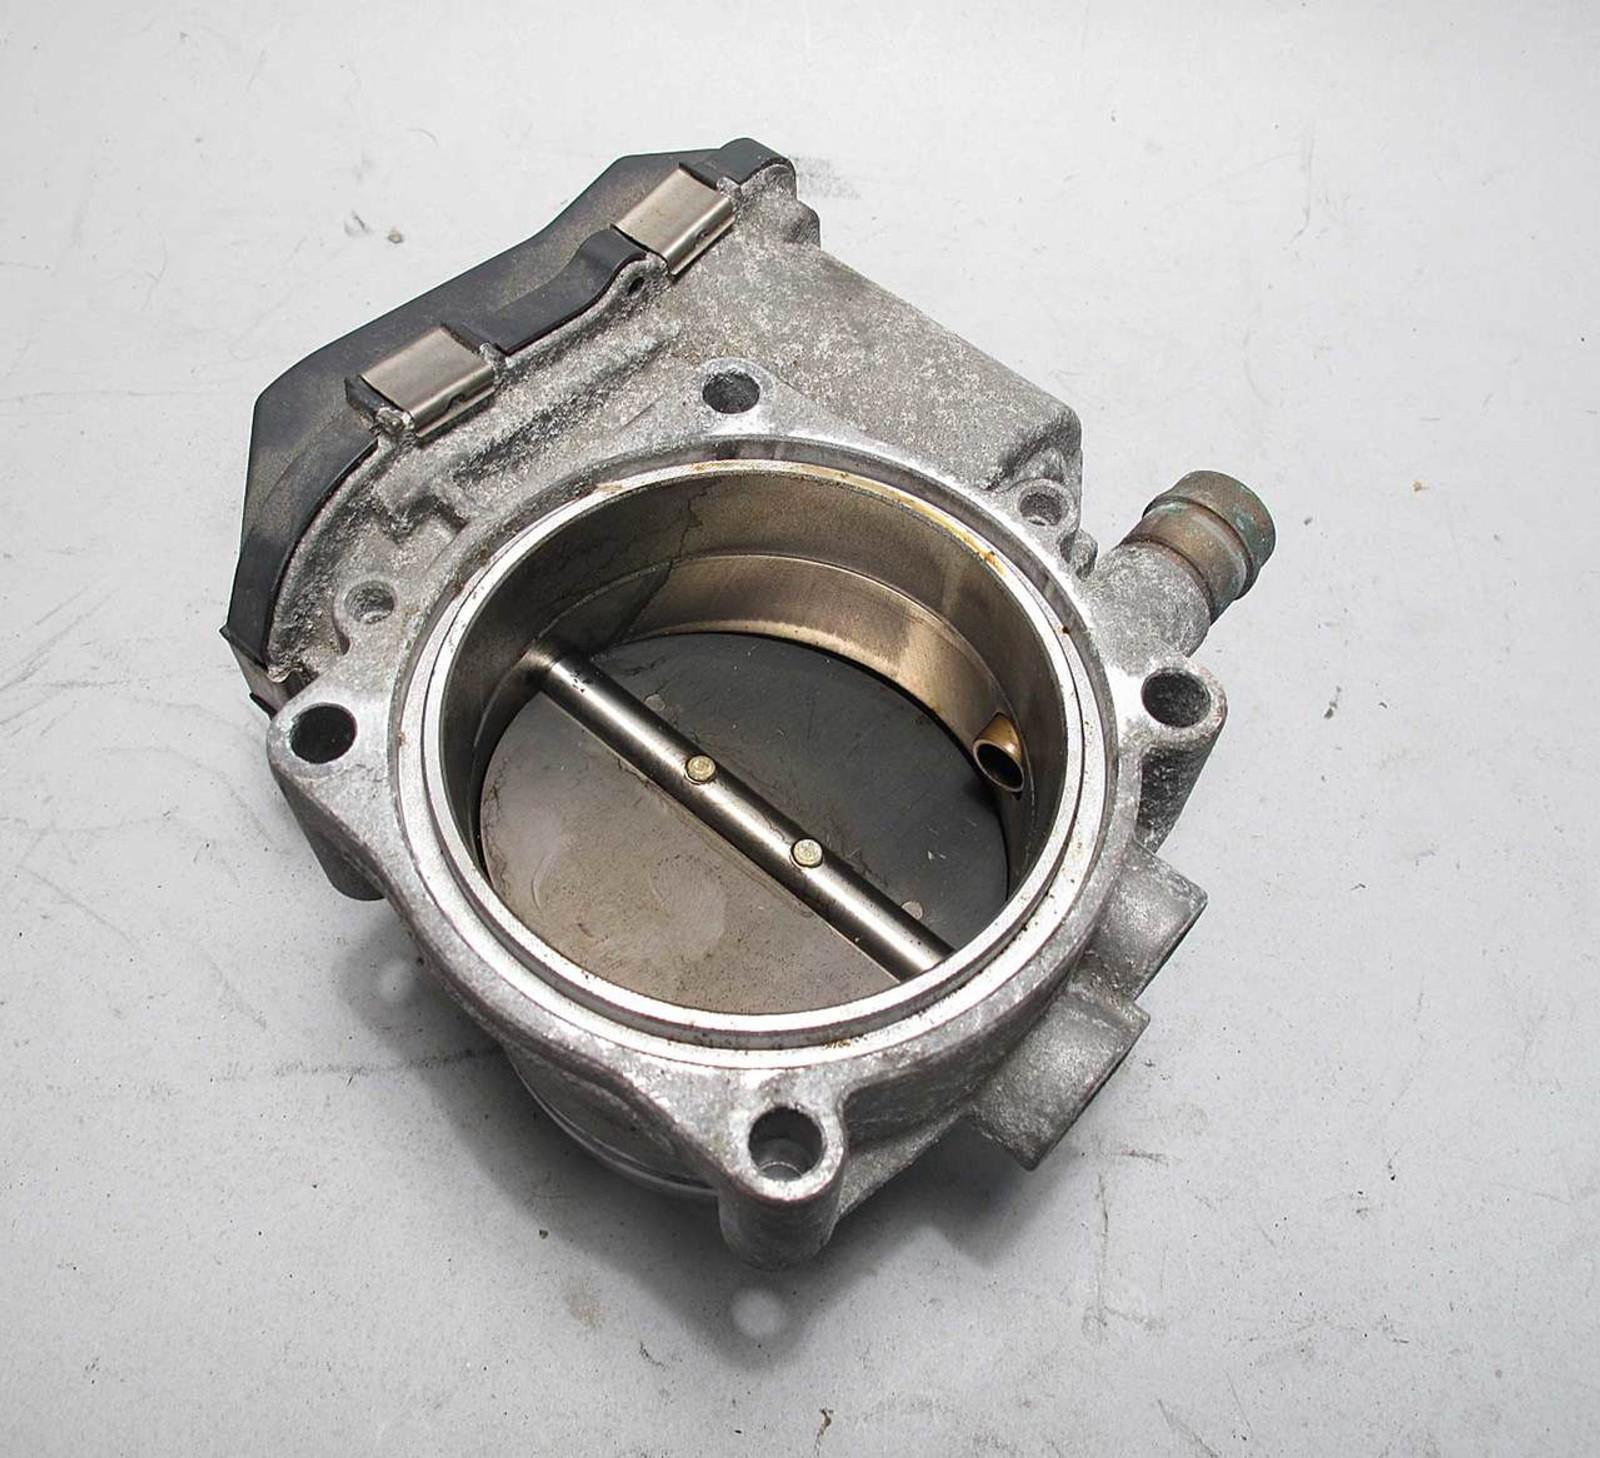 N55 Pneumatic Wastegate Actuator